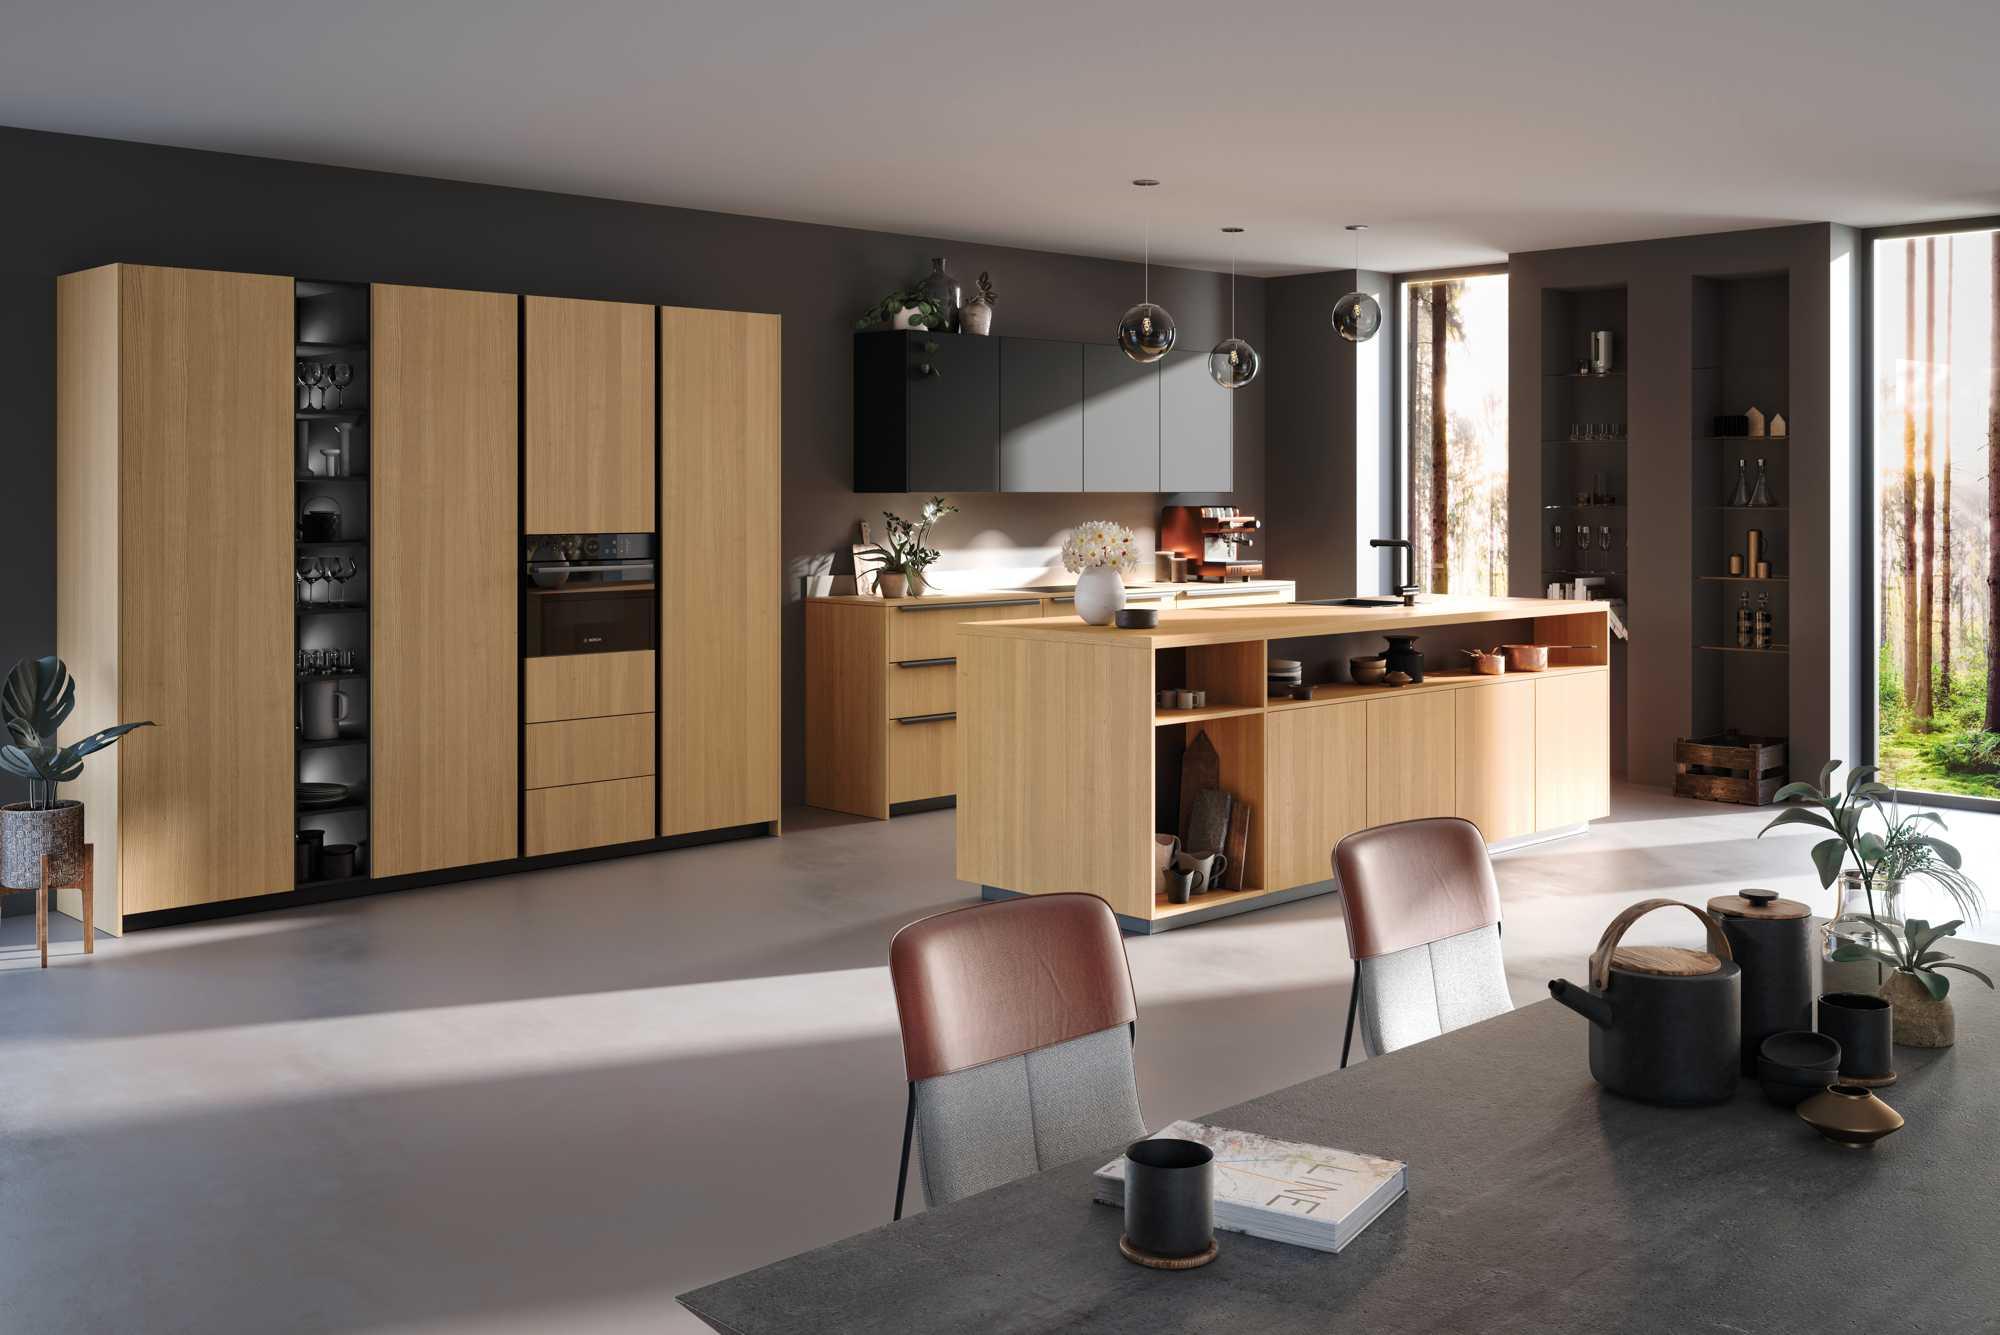 Two tone german kitchen: ZeroxVER FM City Natural and Oak Zerox XPL XT Black